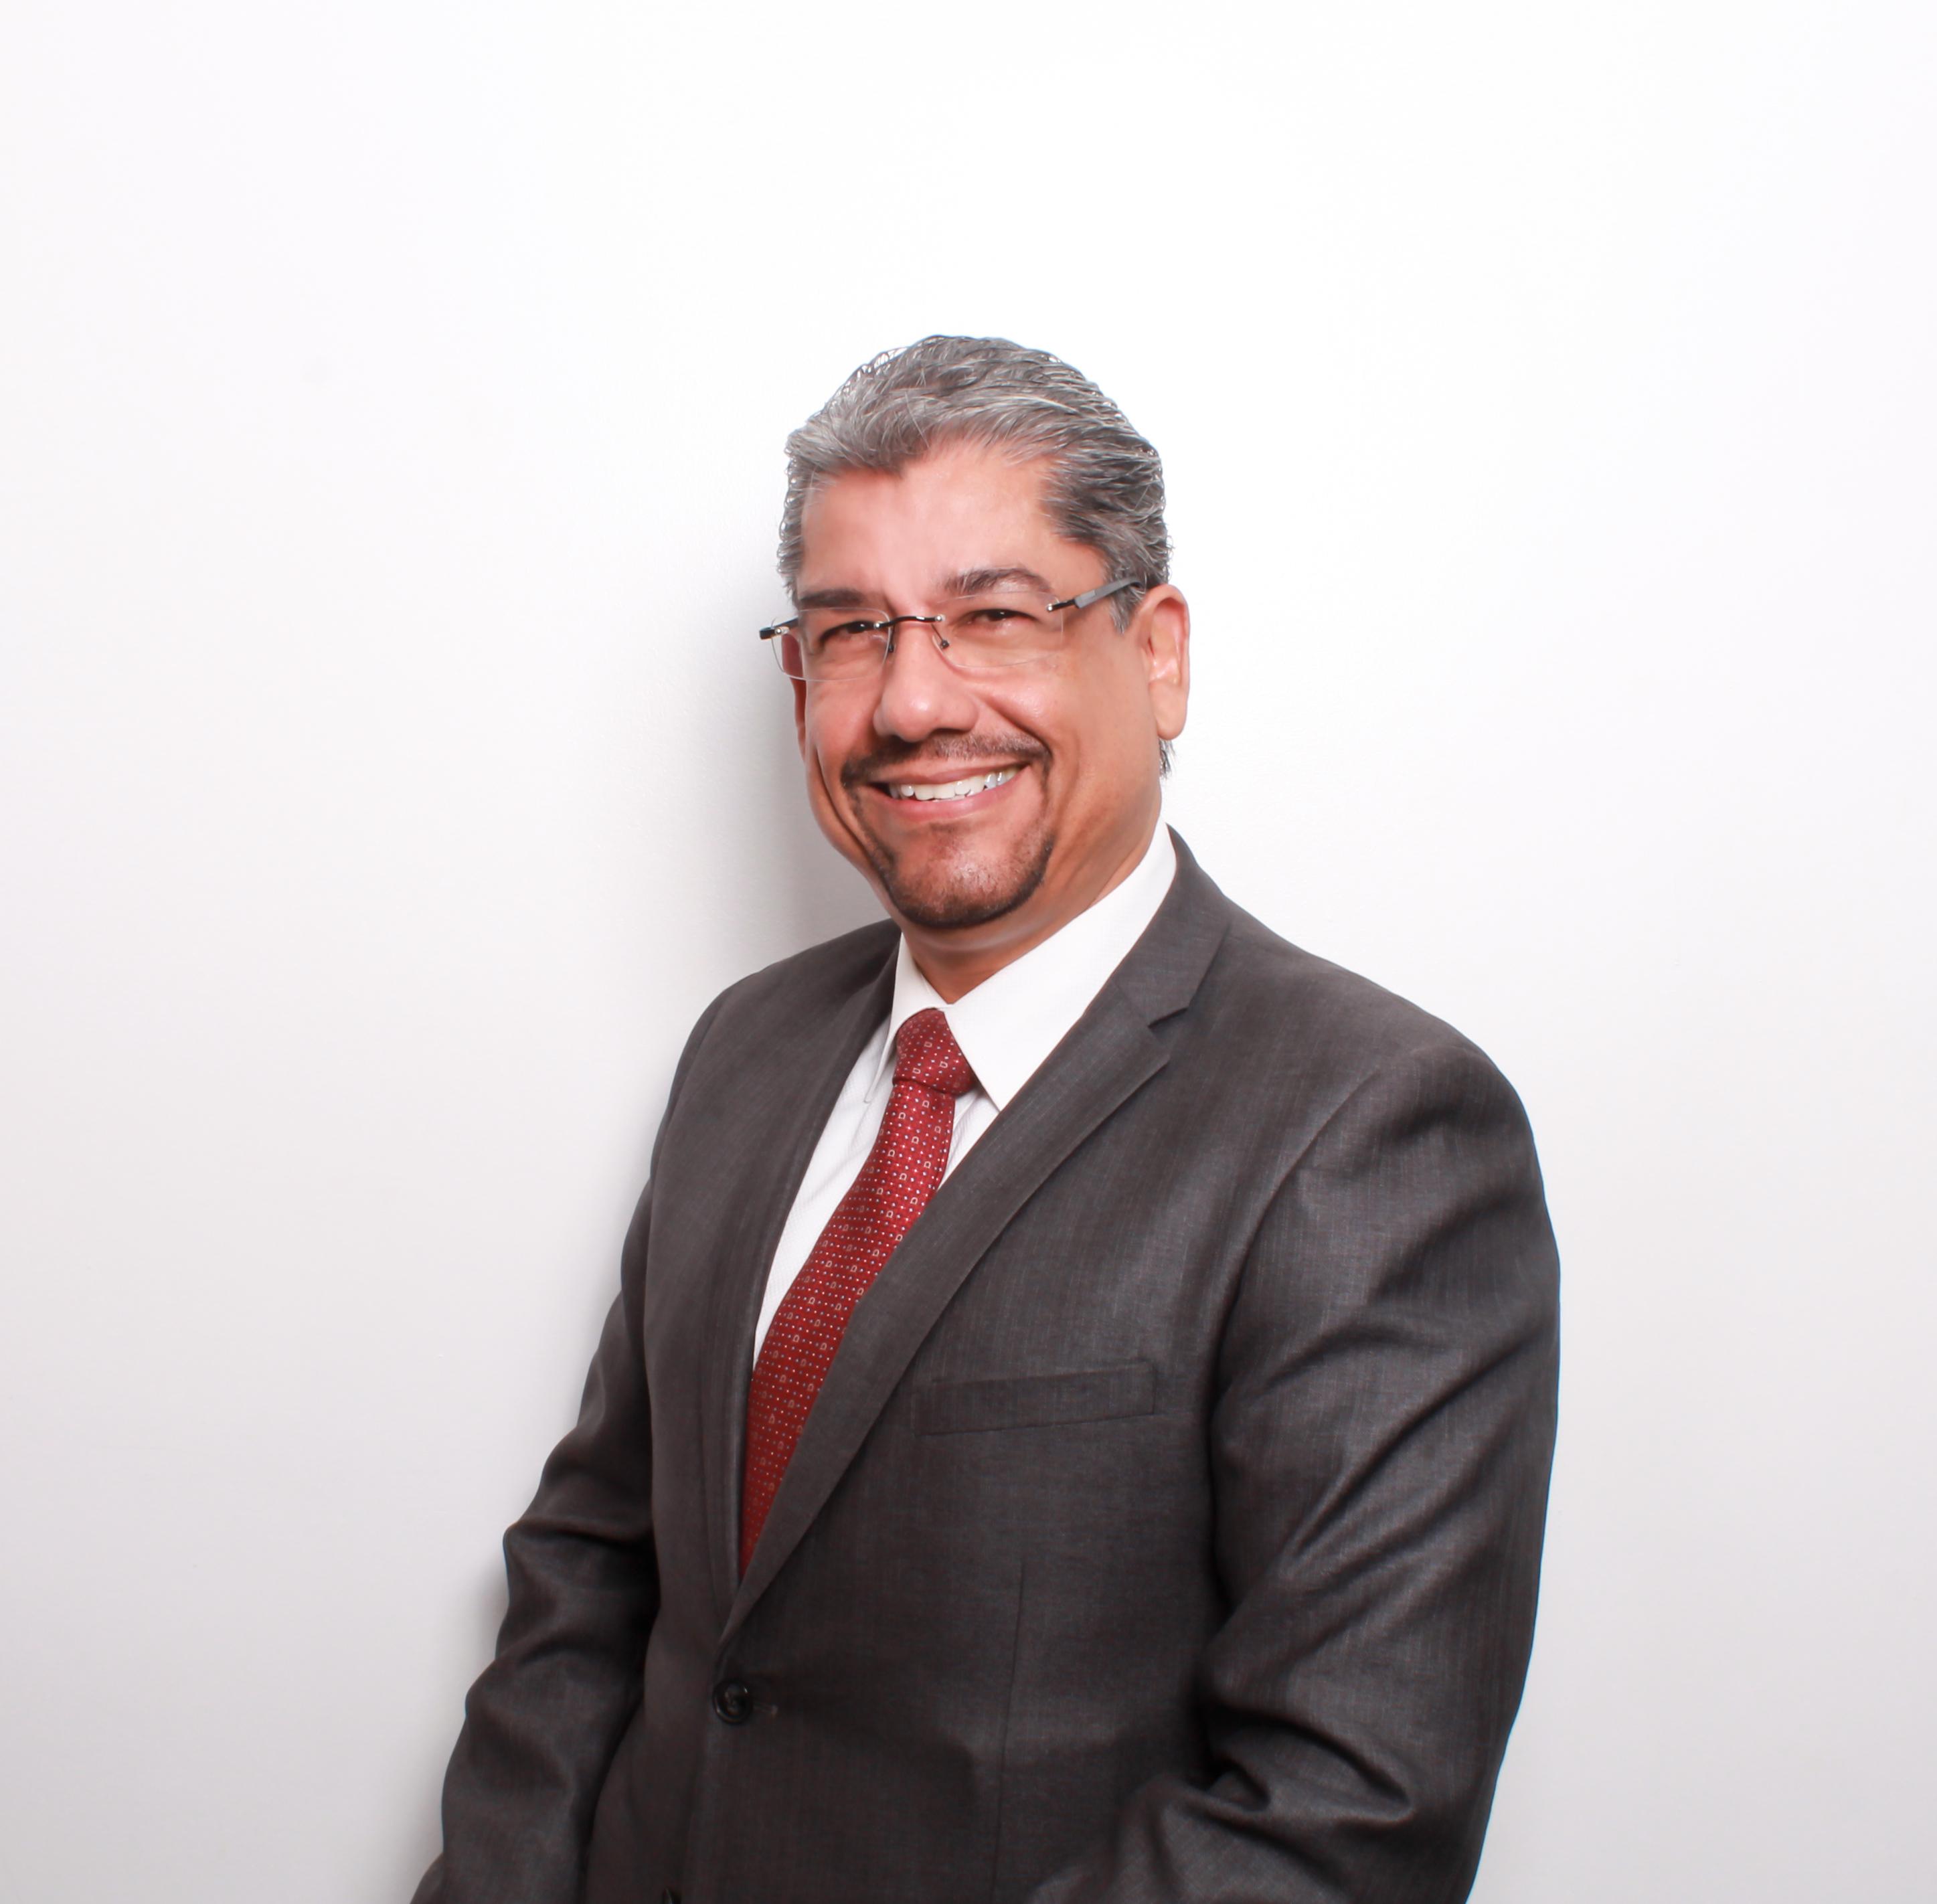 Allan Guevara - Siuma expertos